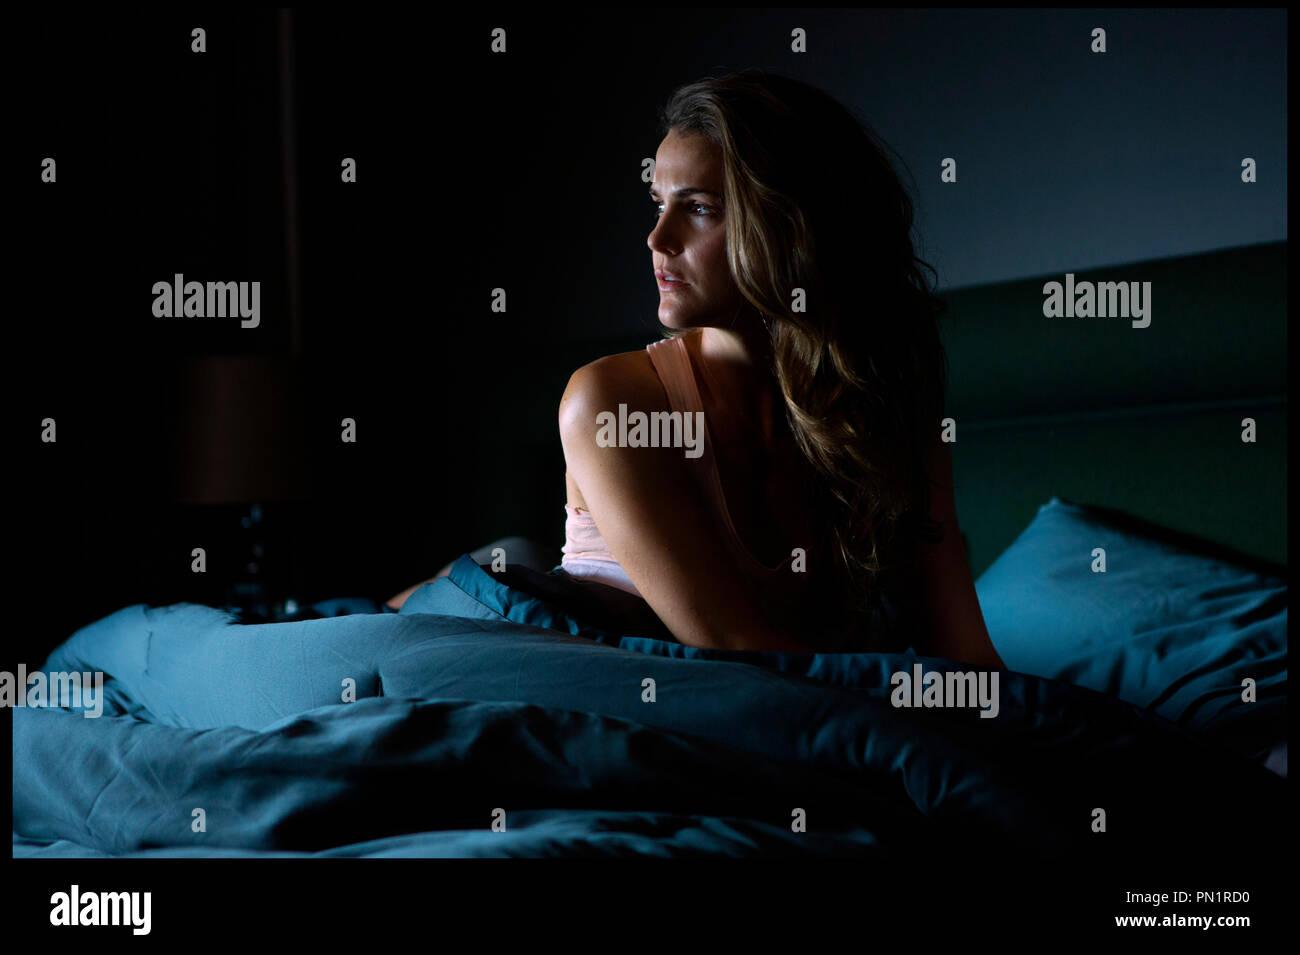 Prod DB © Alliance Films - Blumhouse Productions / DR DARK